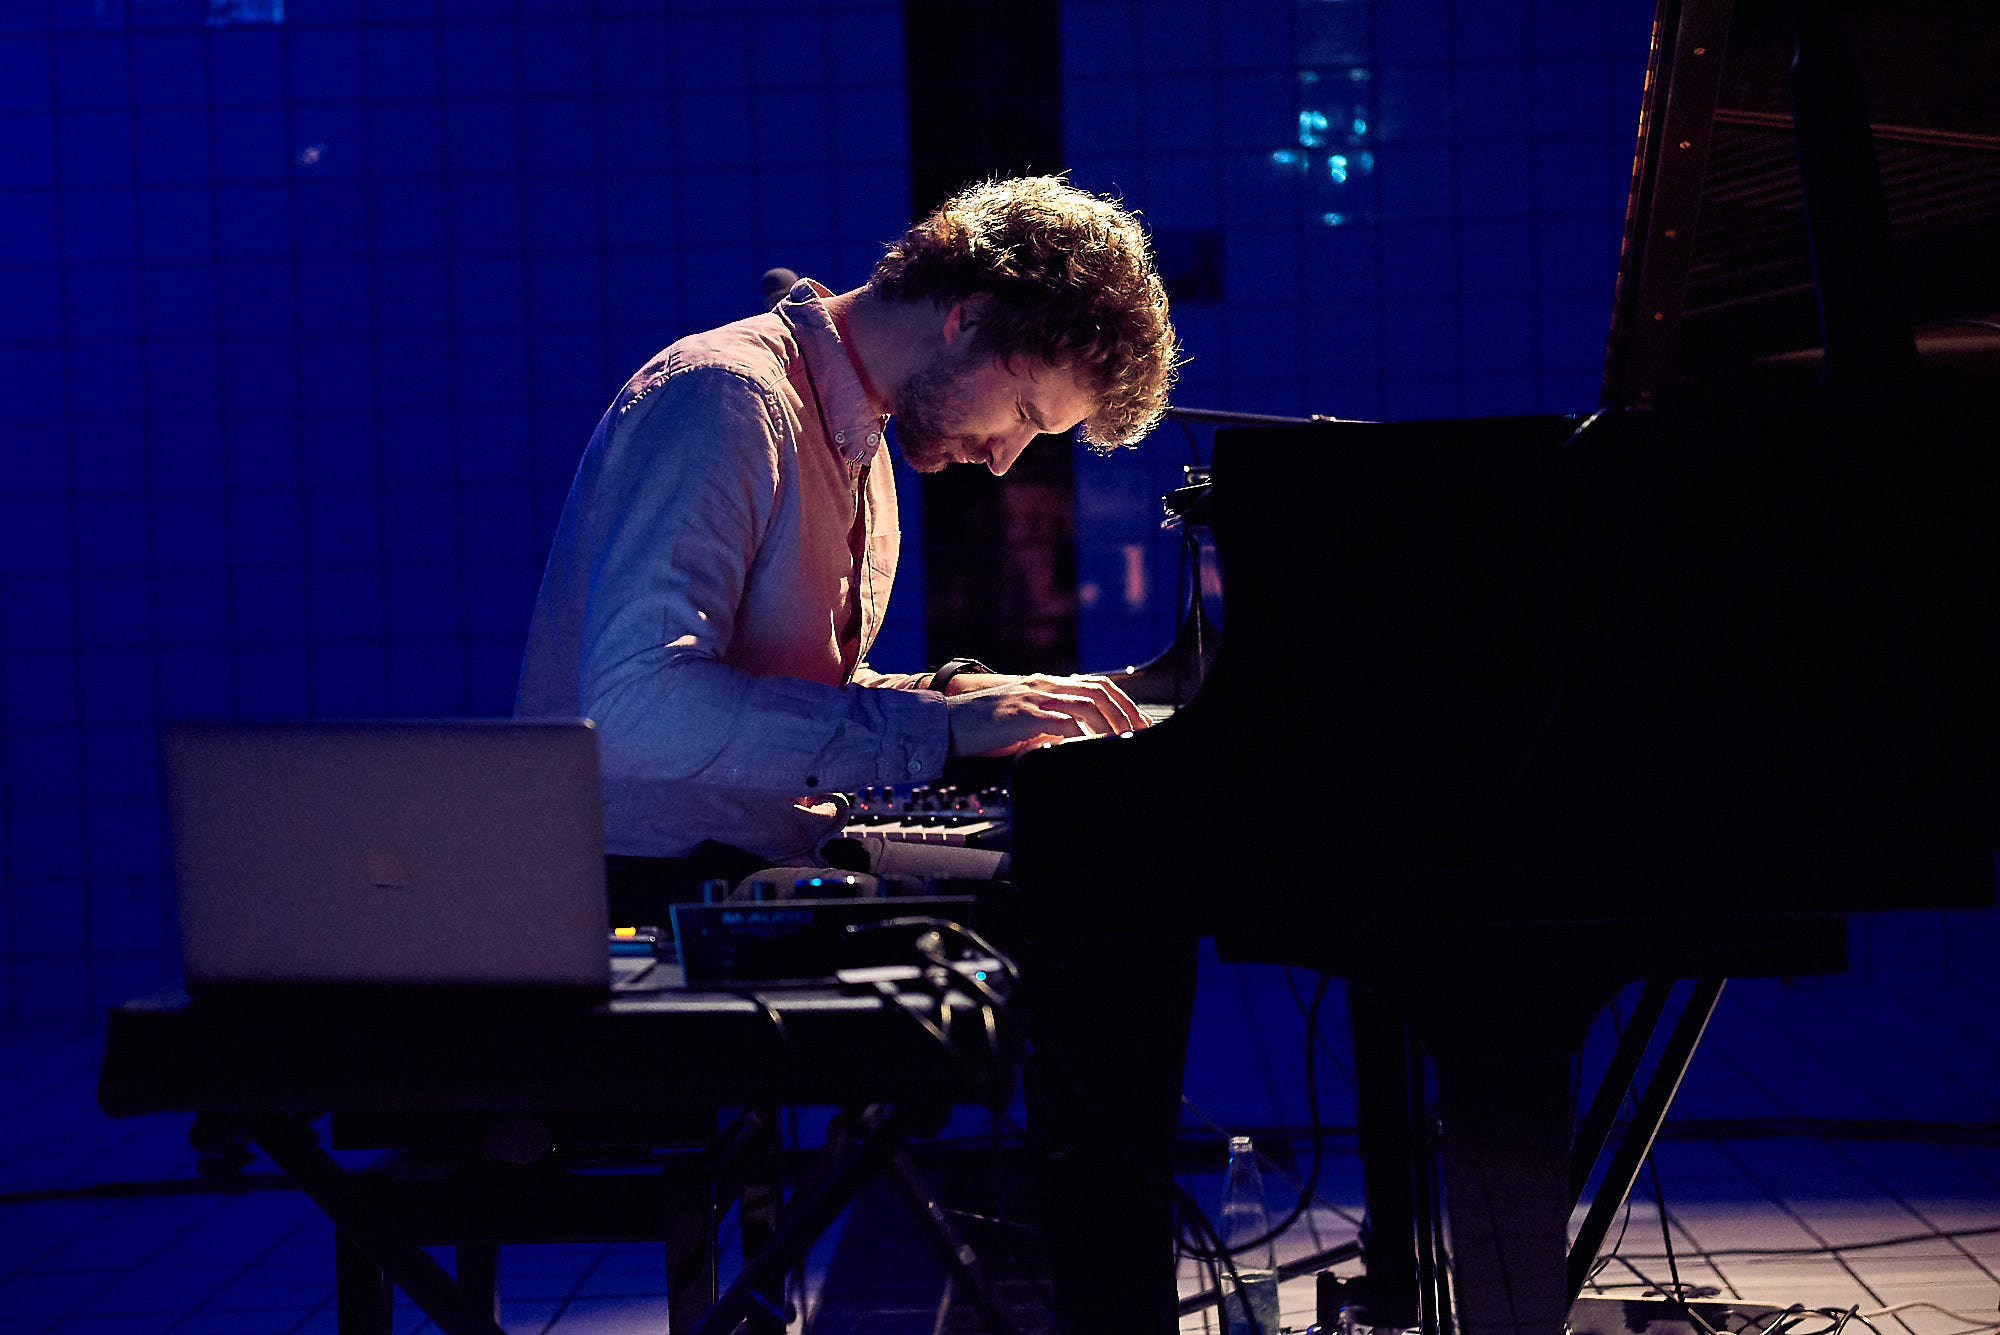 Piano im Pool Festival Luzern 2018, Obradovic Tixier Duo